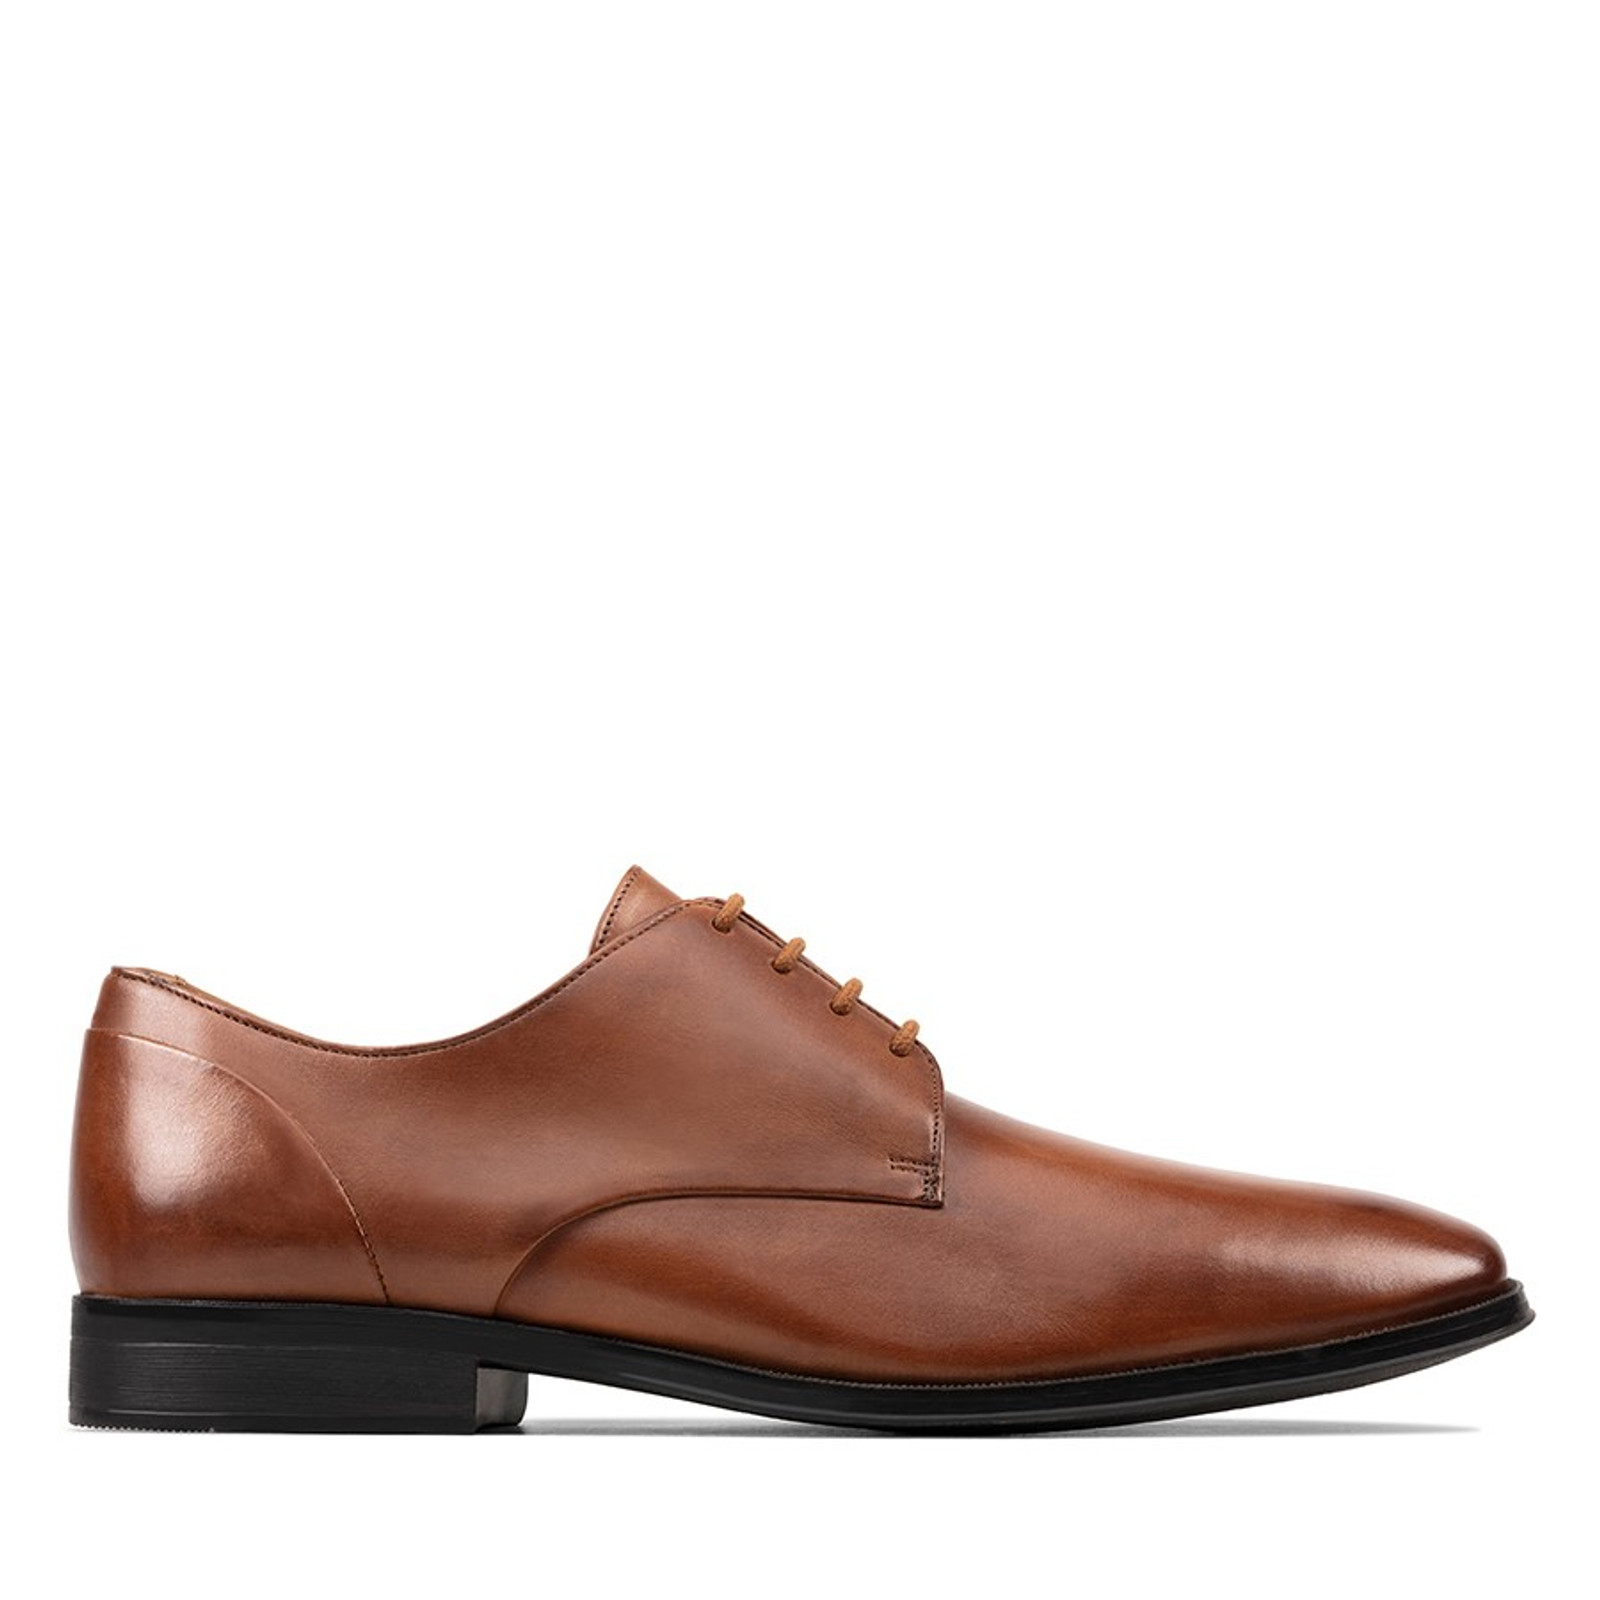 Clarks Mens GILMAN PLAIN Tan Leather